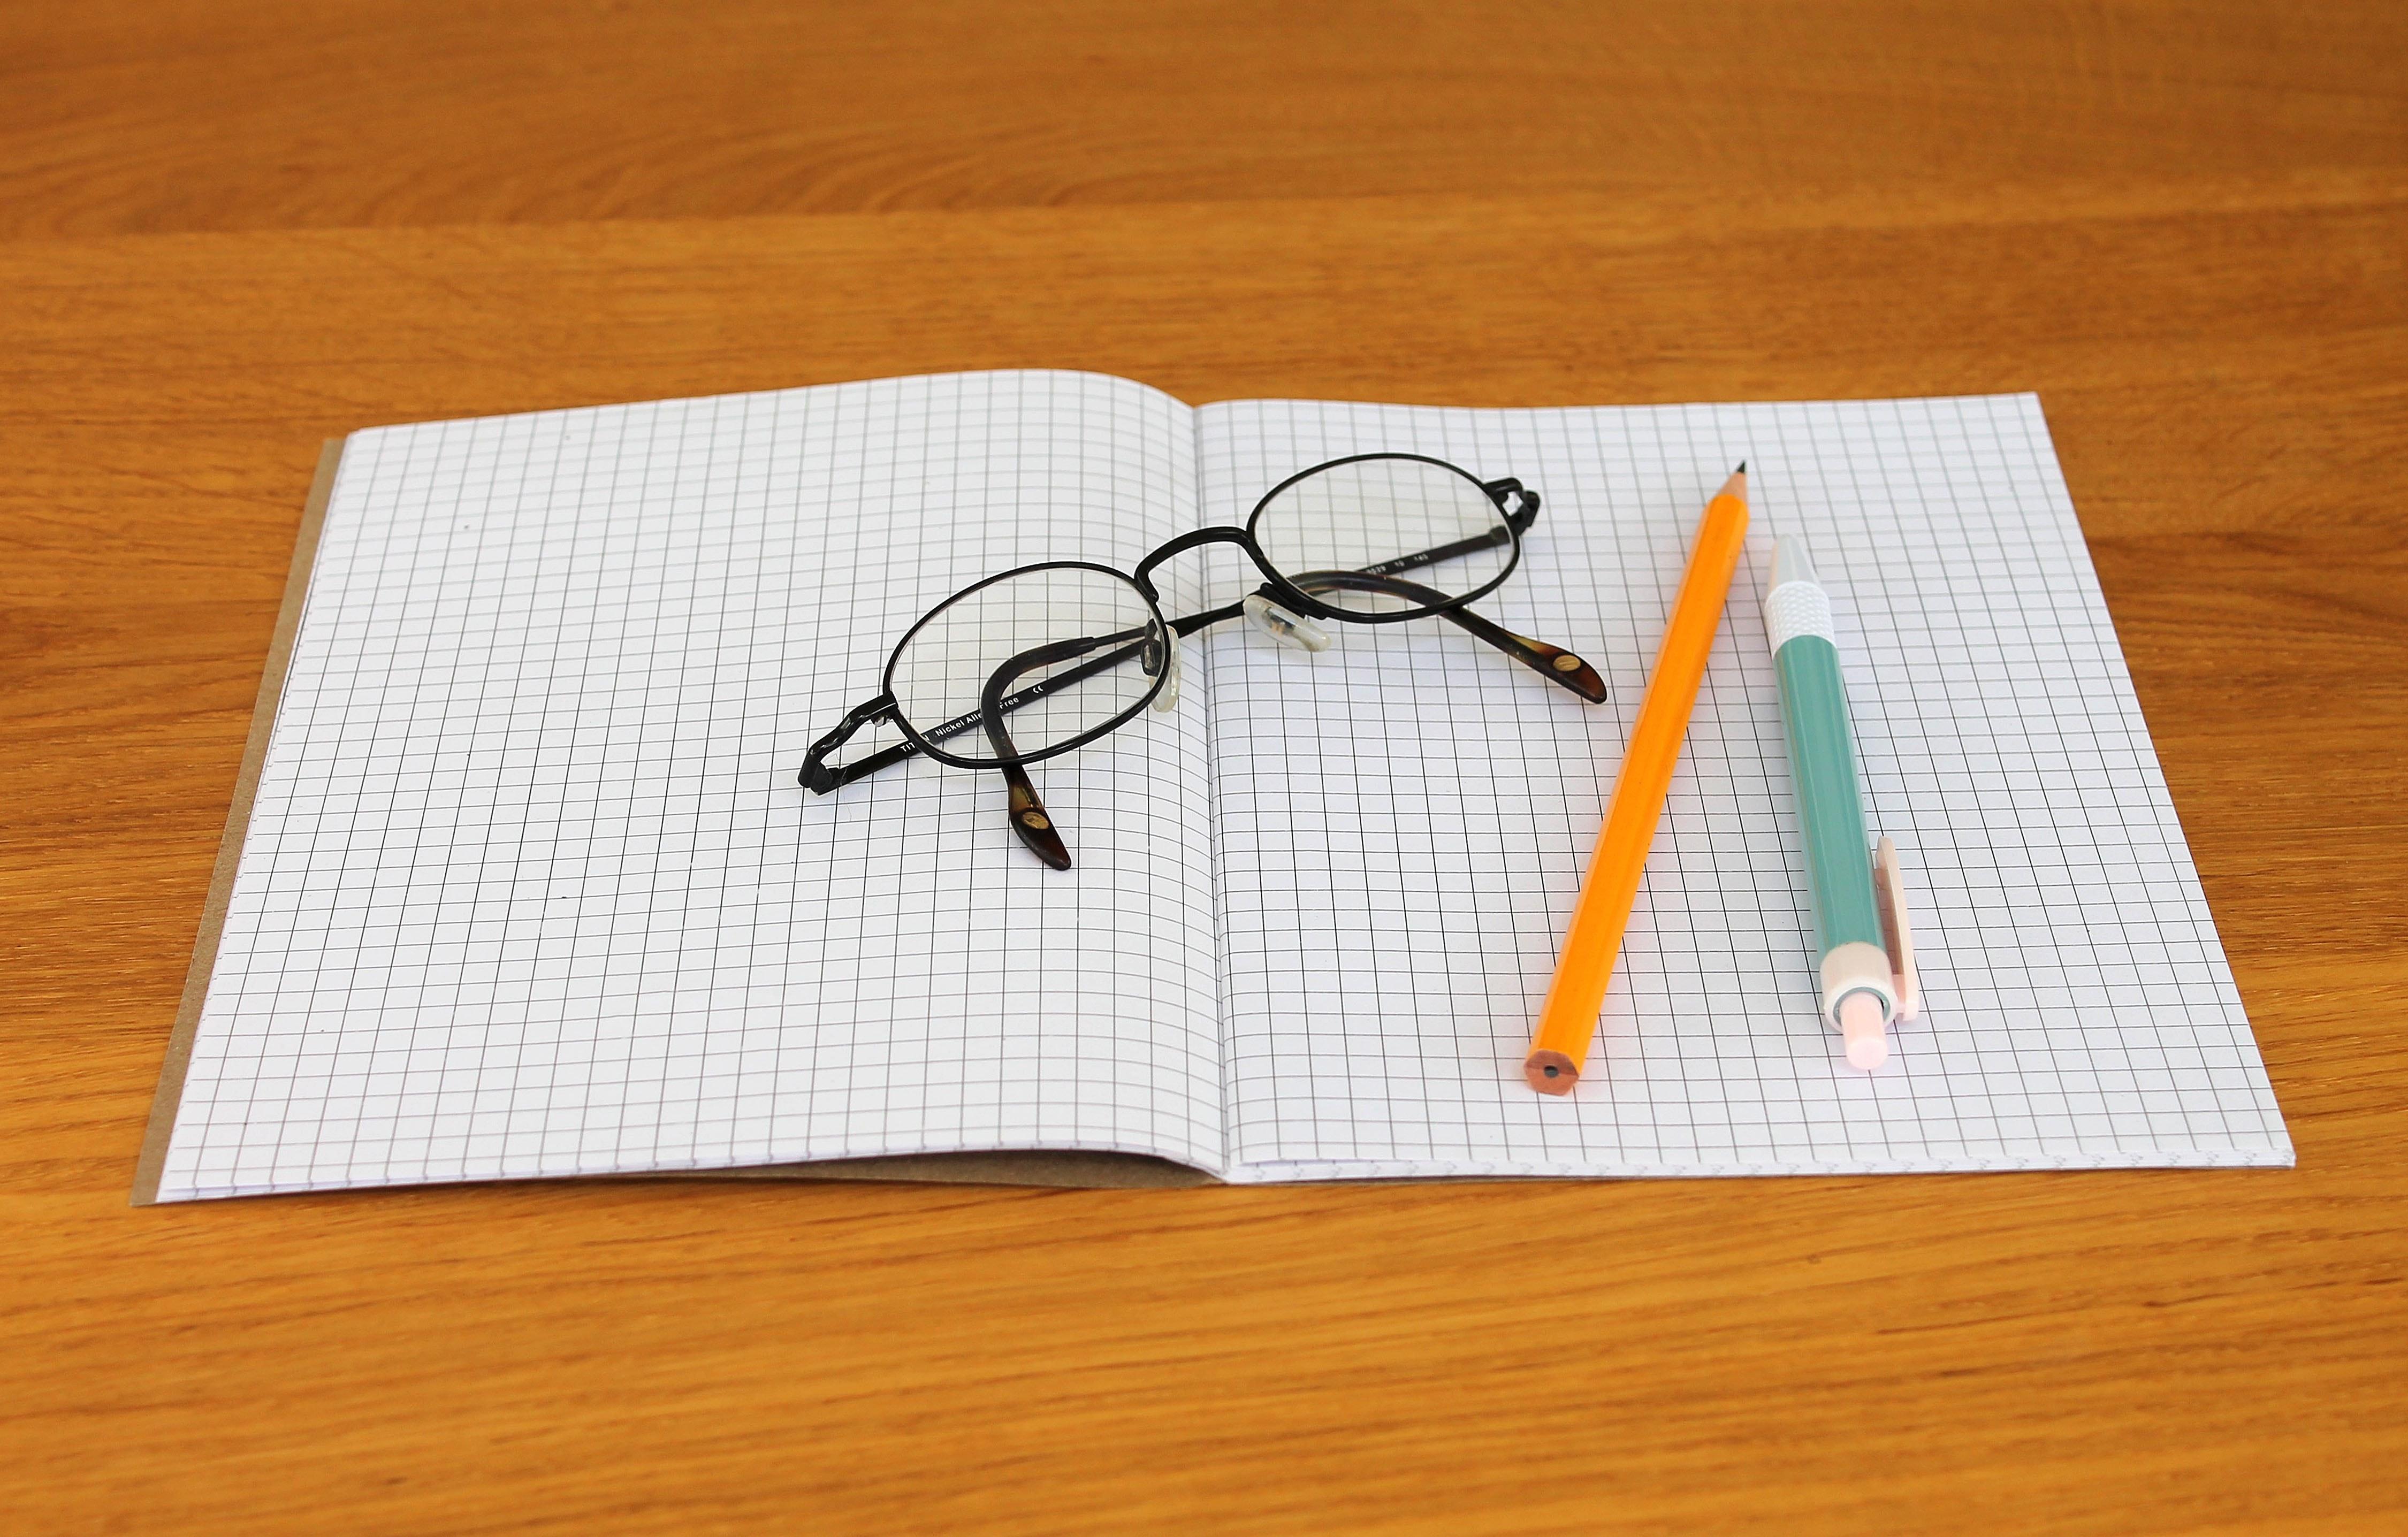 Black framed eyeglass on graphing paper photo